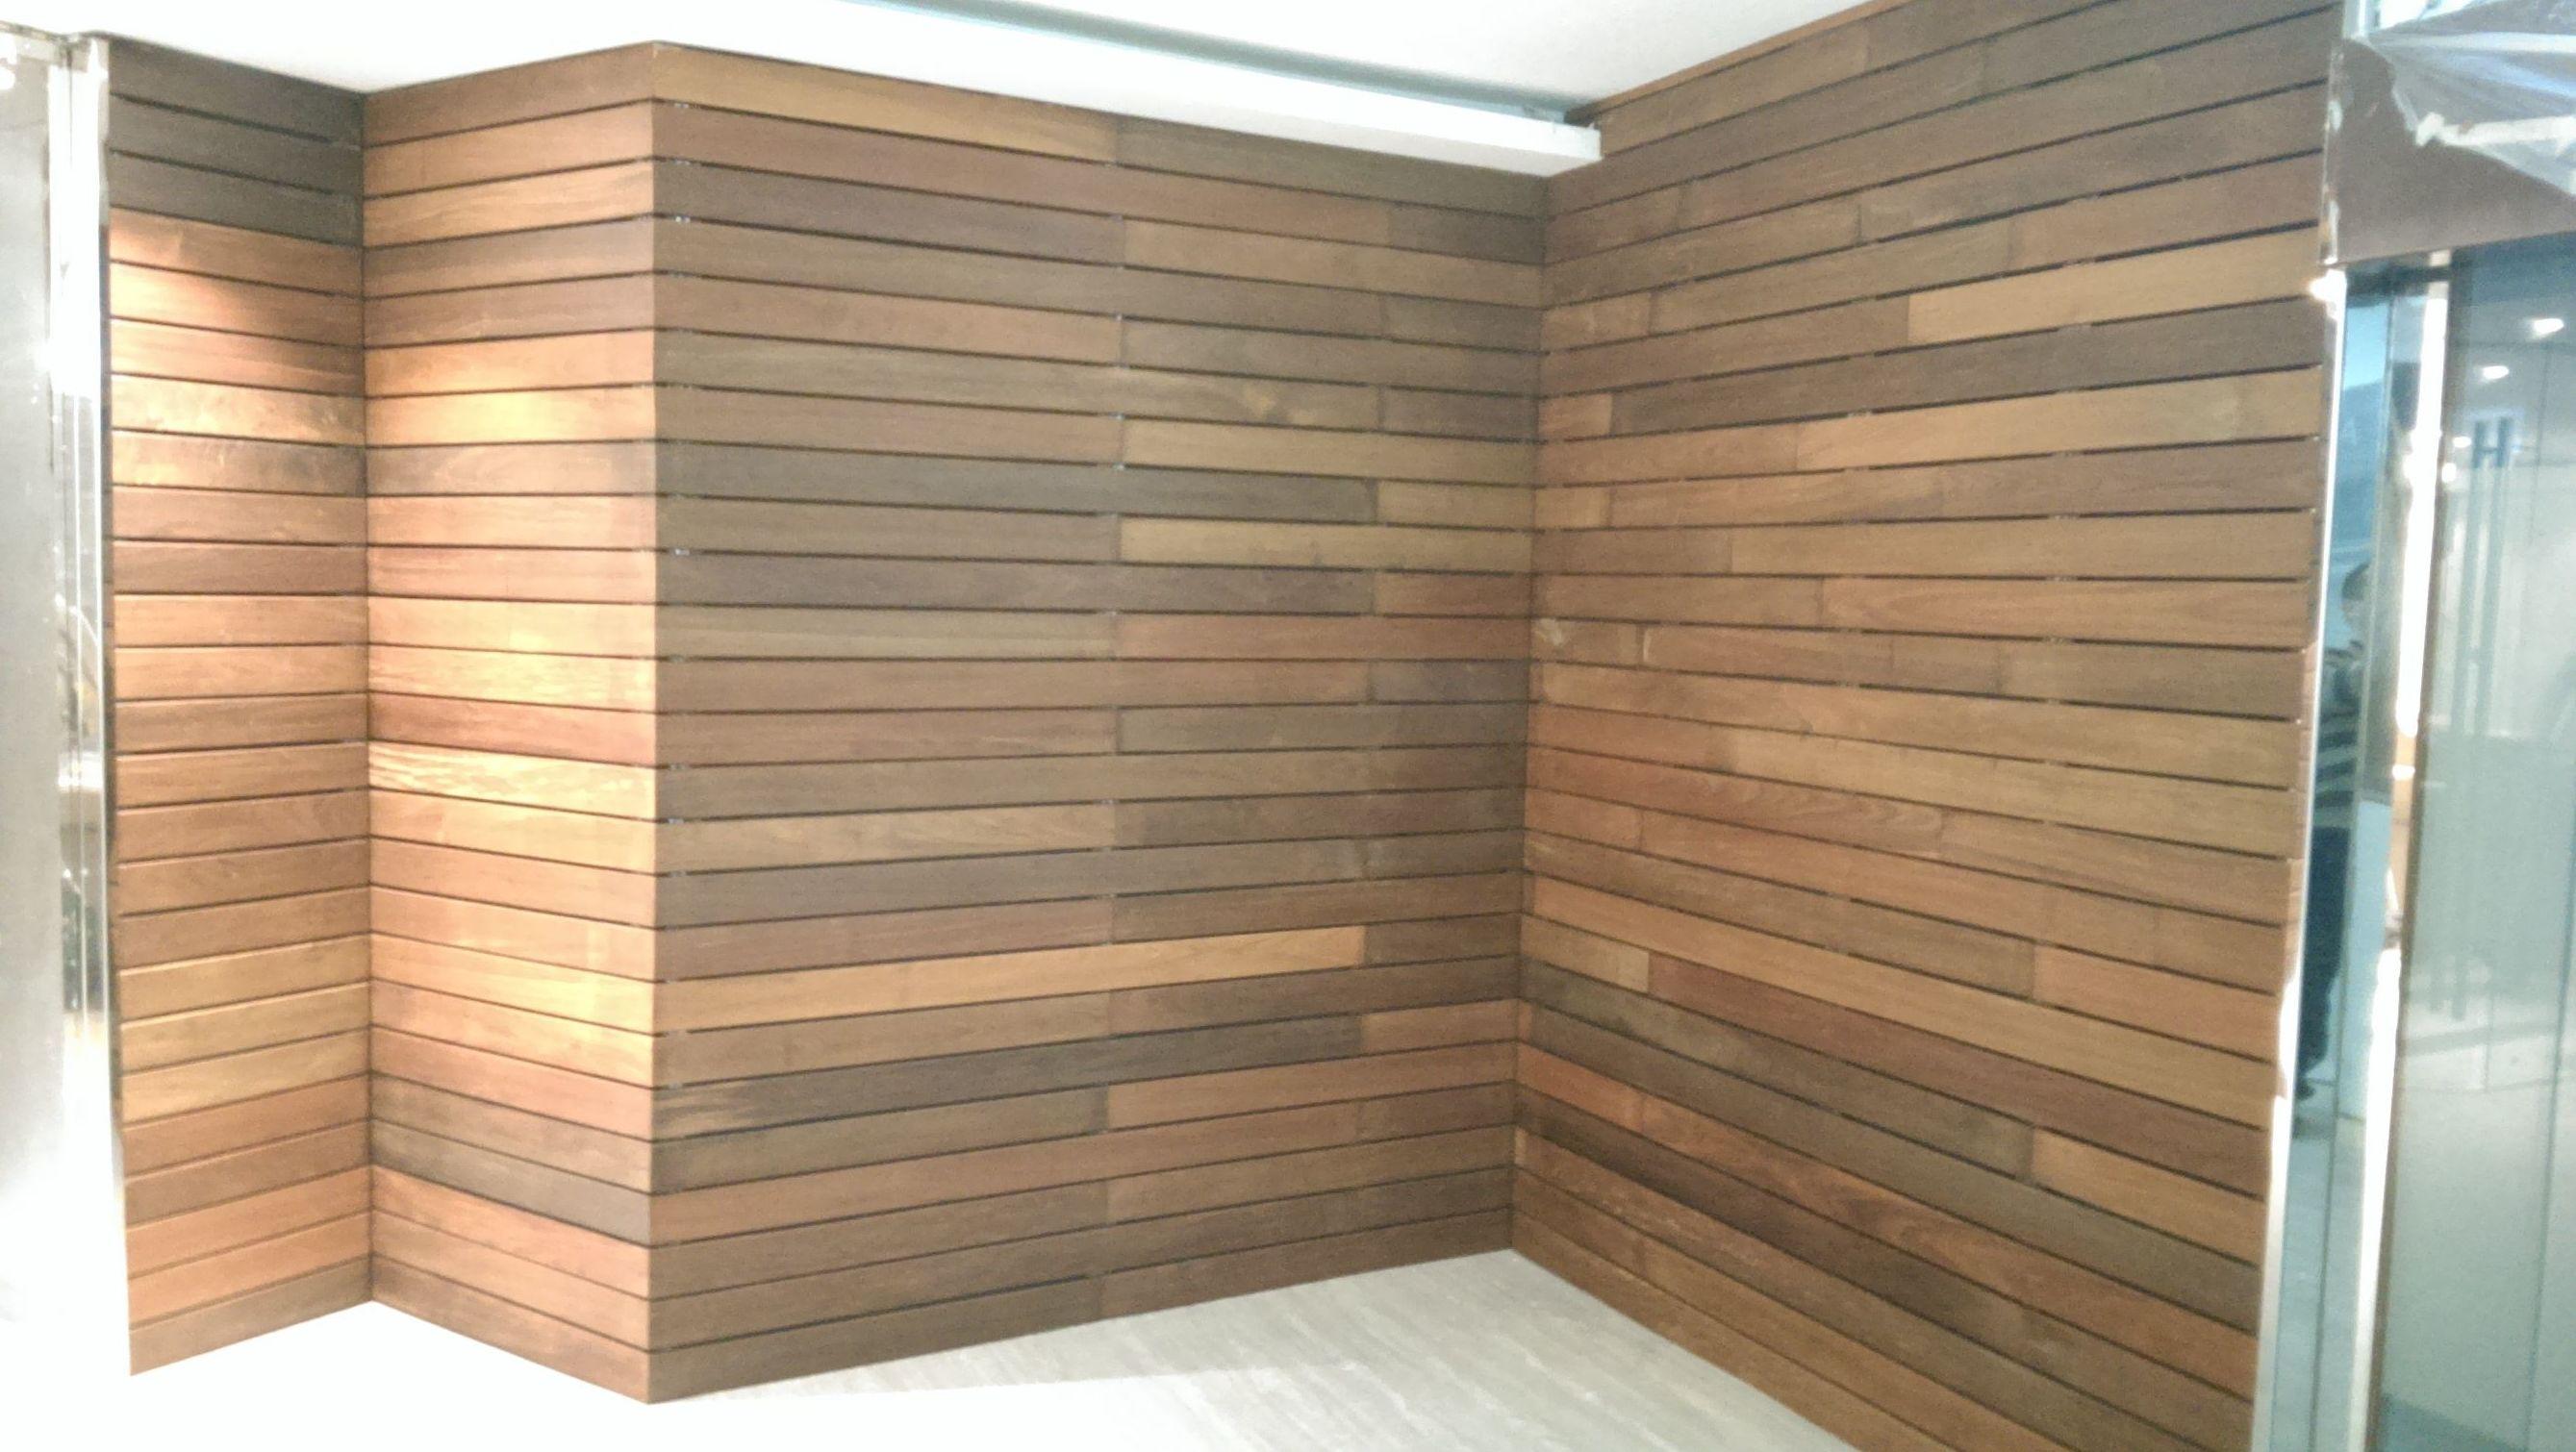 Tarimas de exterior en madera de ipe composite tecnologica - Maderas de exterior ...